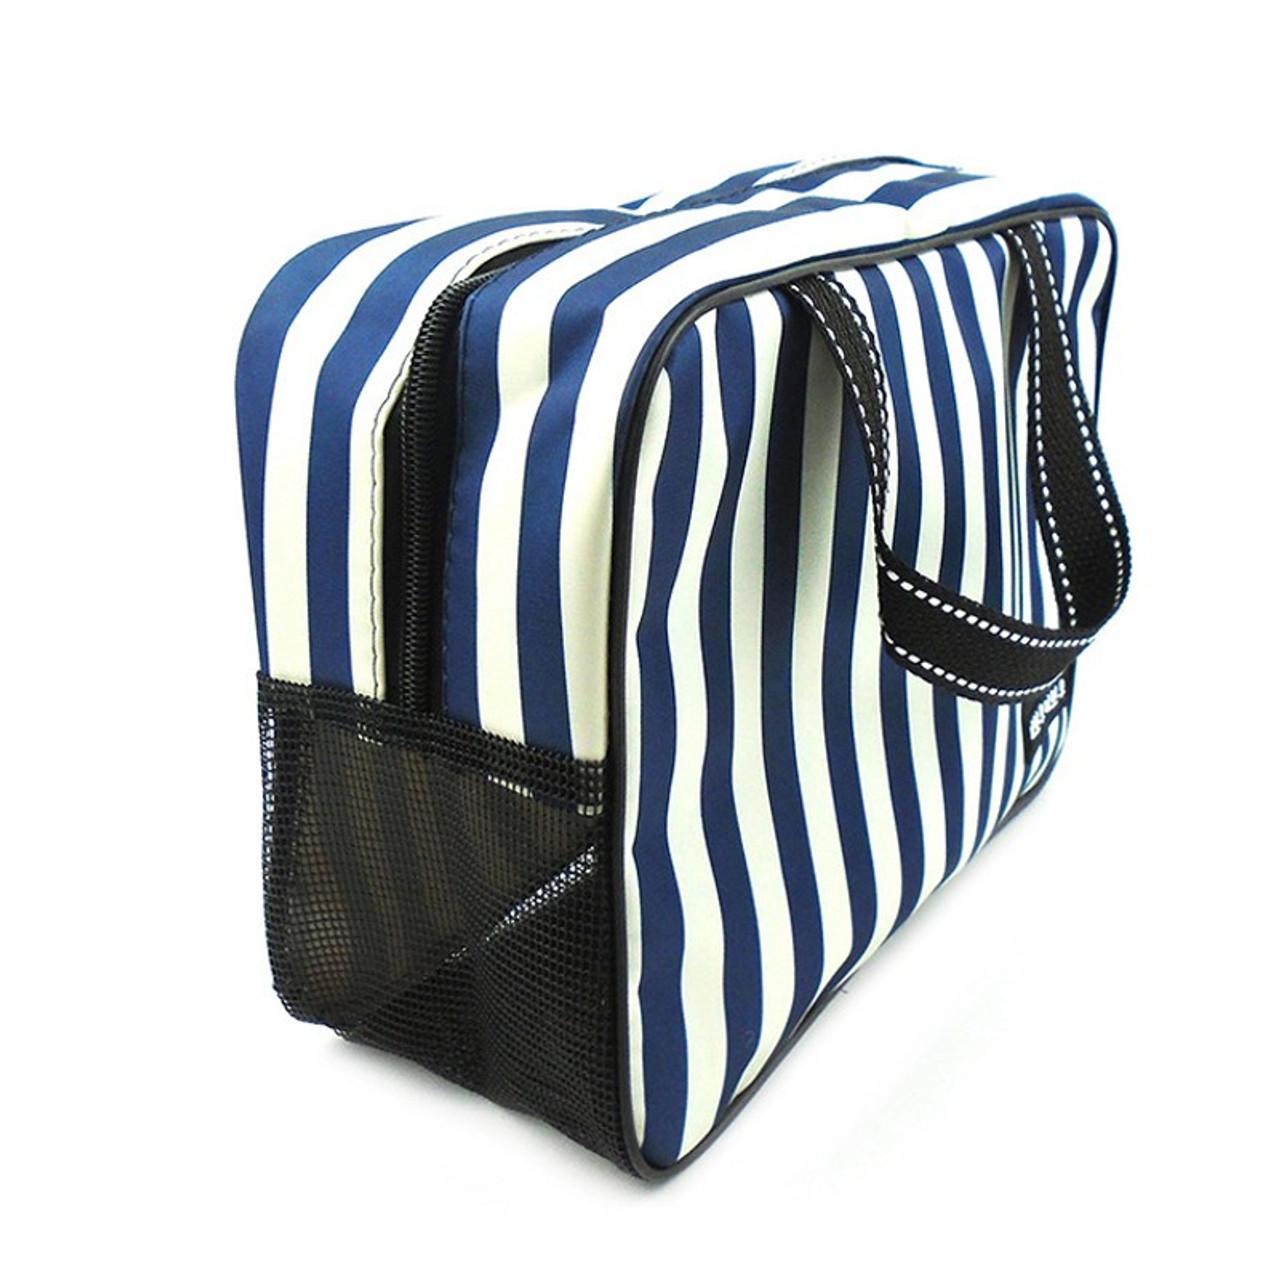 db9662fc124e ... New Women And Men Large Waterproof Makeup Bag Oxford Cloth Travel Wash Bag  Organizer Case Necessaries ...